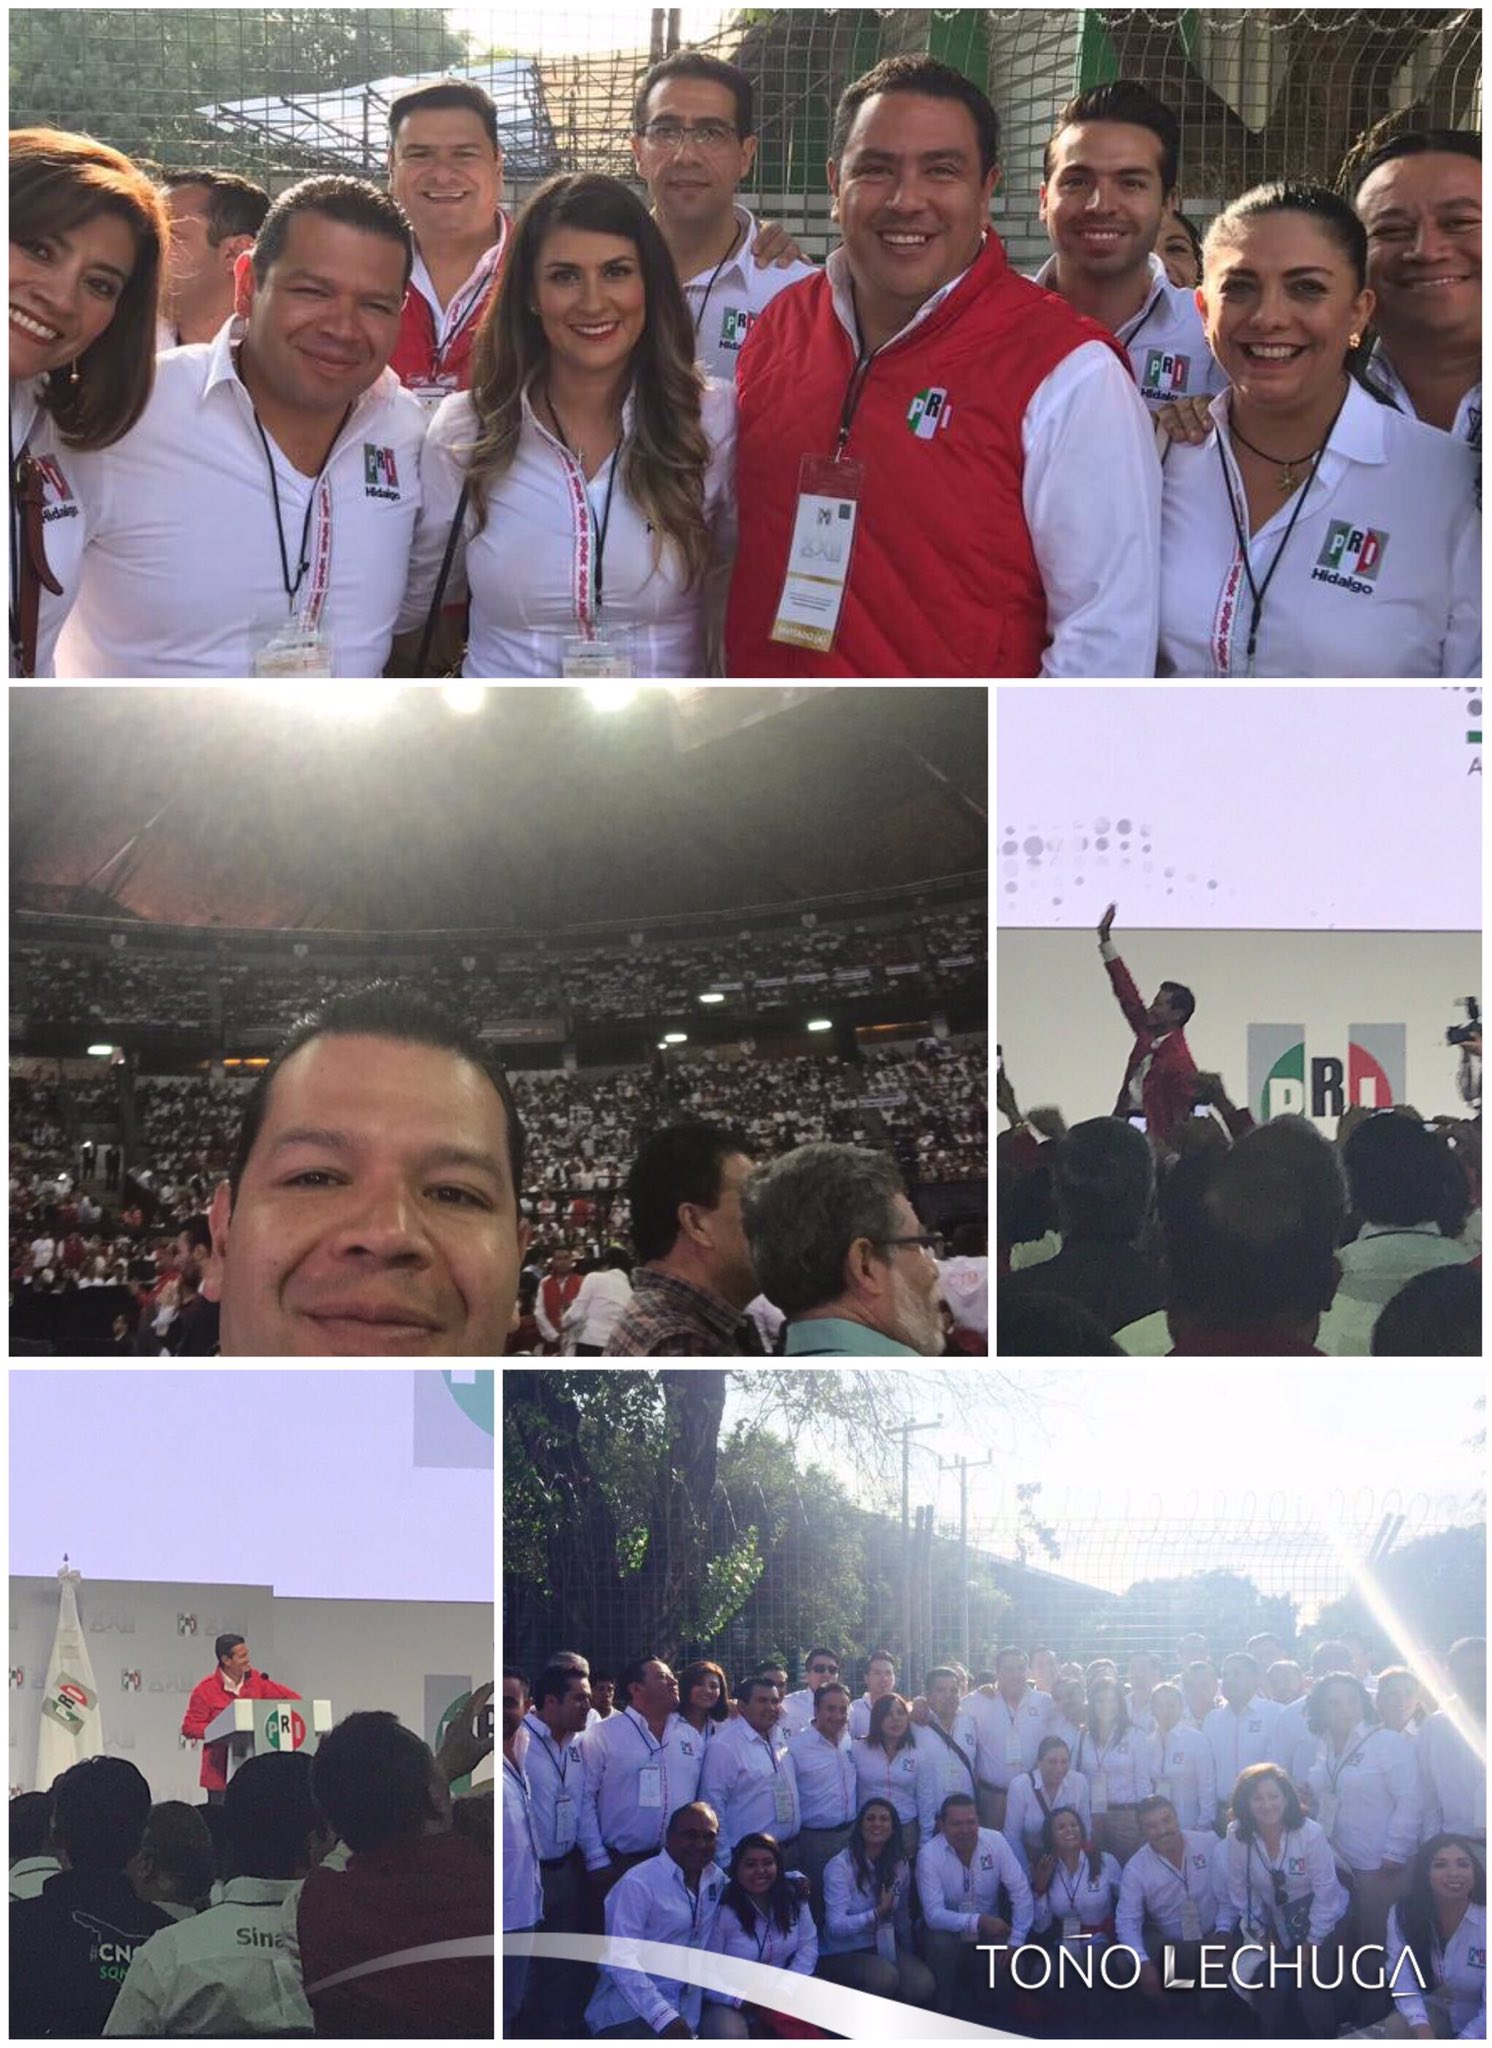 Presente en la #XXIIAsambleaNacional  del @PRI_Nacional con nuestro Presidente @EPN #TuVozPrimero https://t.co/8MsrjzOFDq